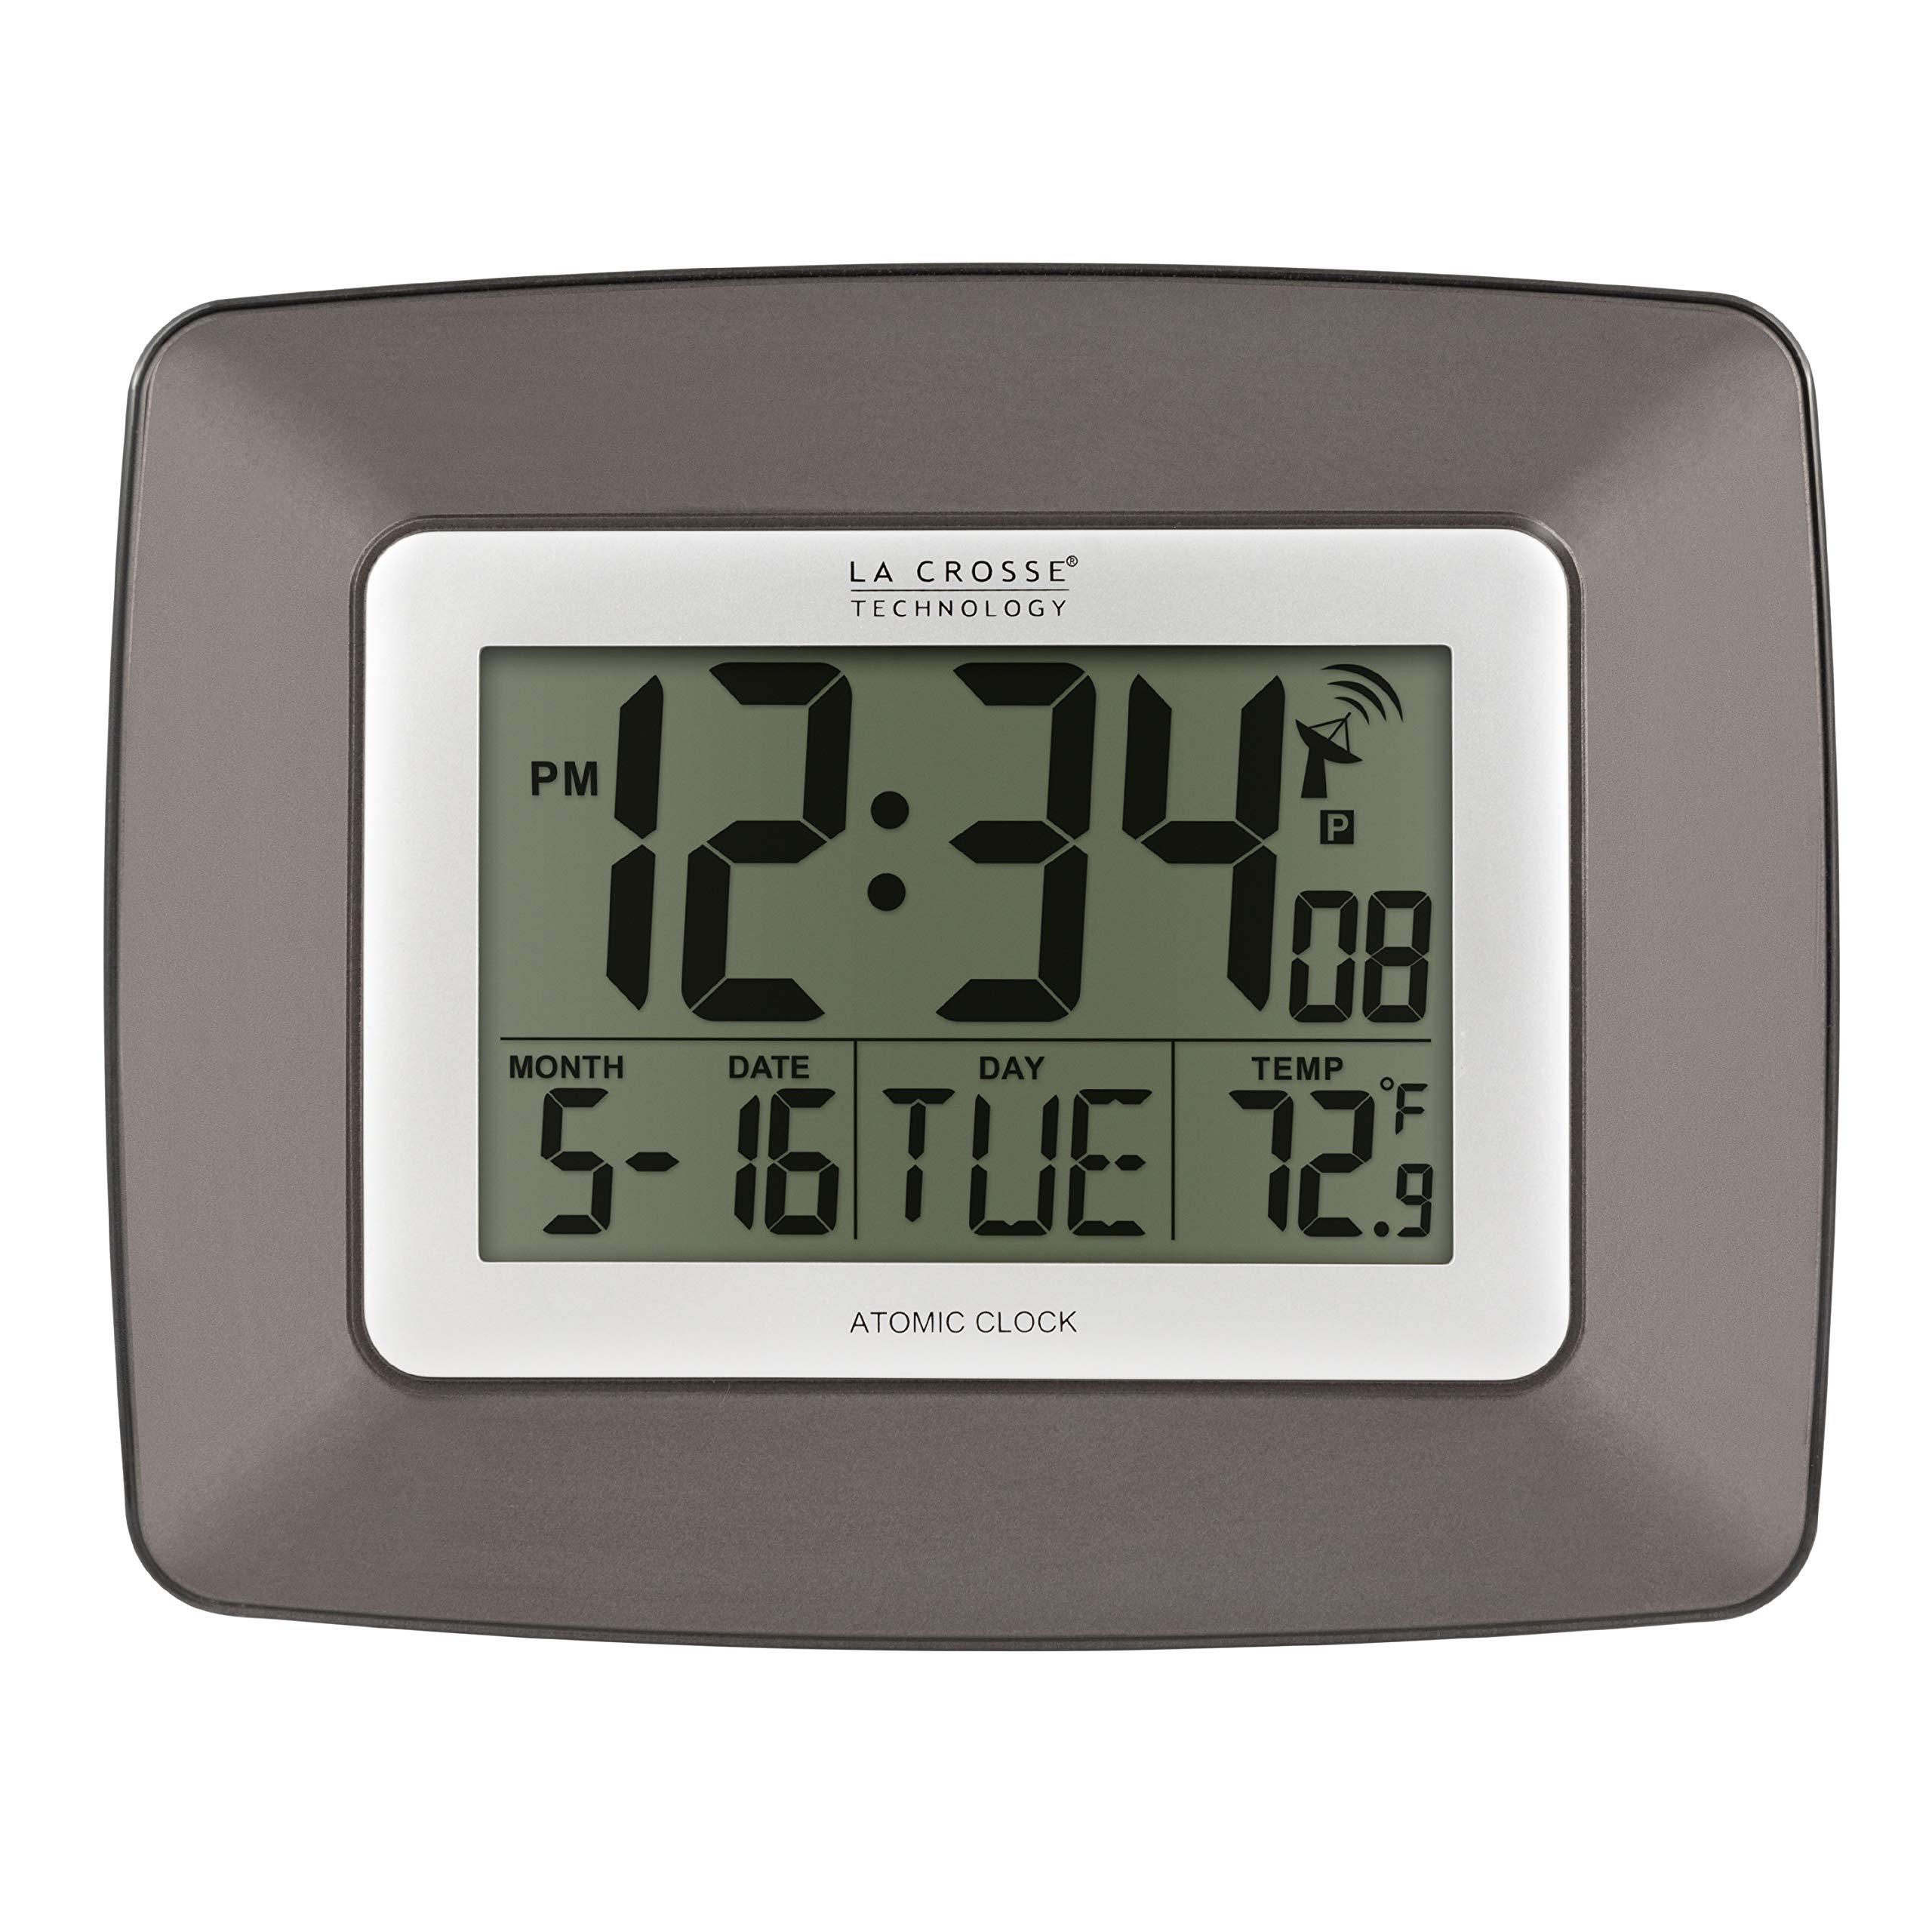 La Crosse Technology WS-8008U-IT Atomic Digital Wall Clock with Temperature